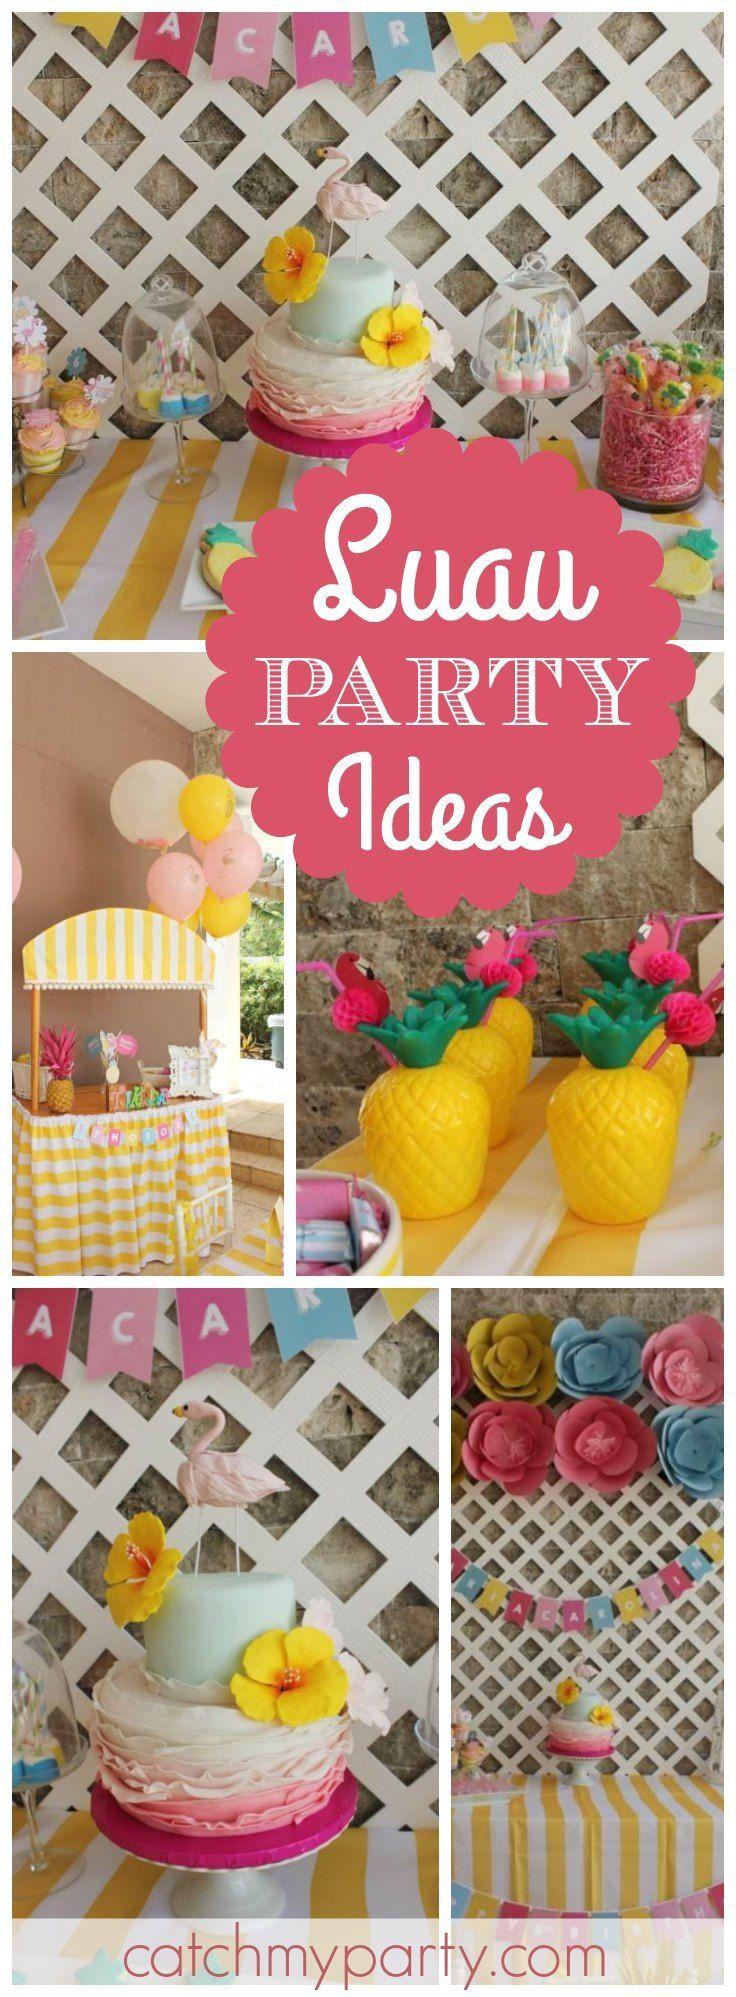 29Th Birthday Party Ideas  Best 20 29th birthday parties ideas on Pinterest